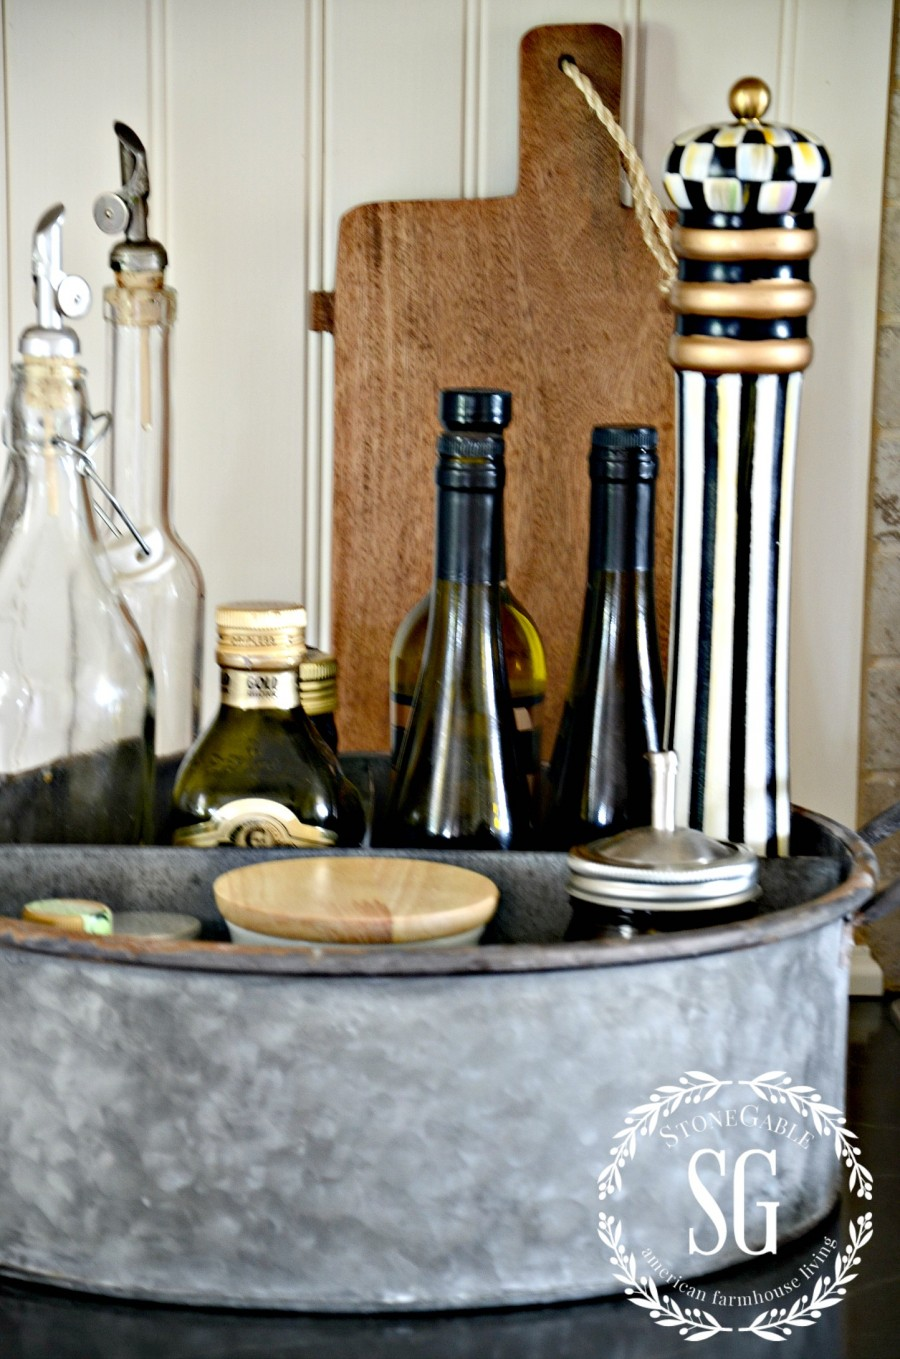 FARMHOUSE KITCHEN -galvanized containter-oil in bottles-stonegableblog.com